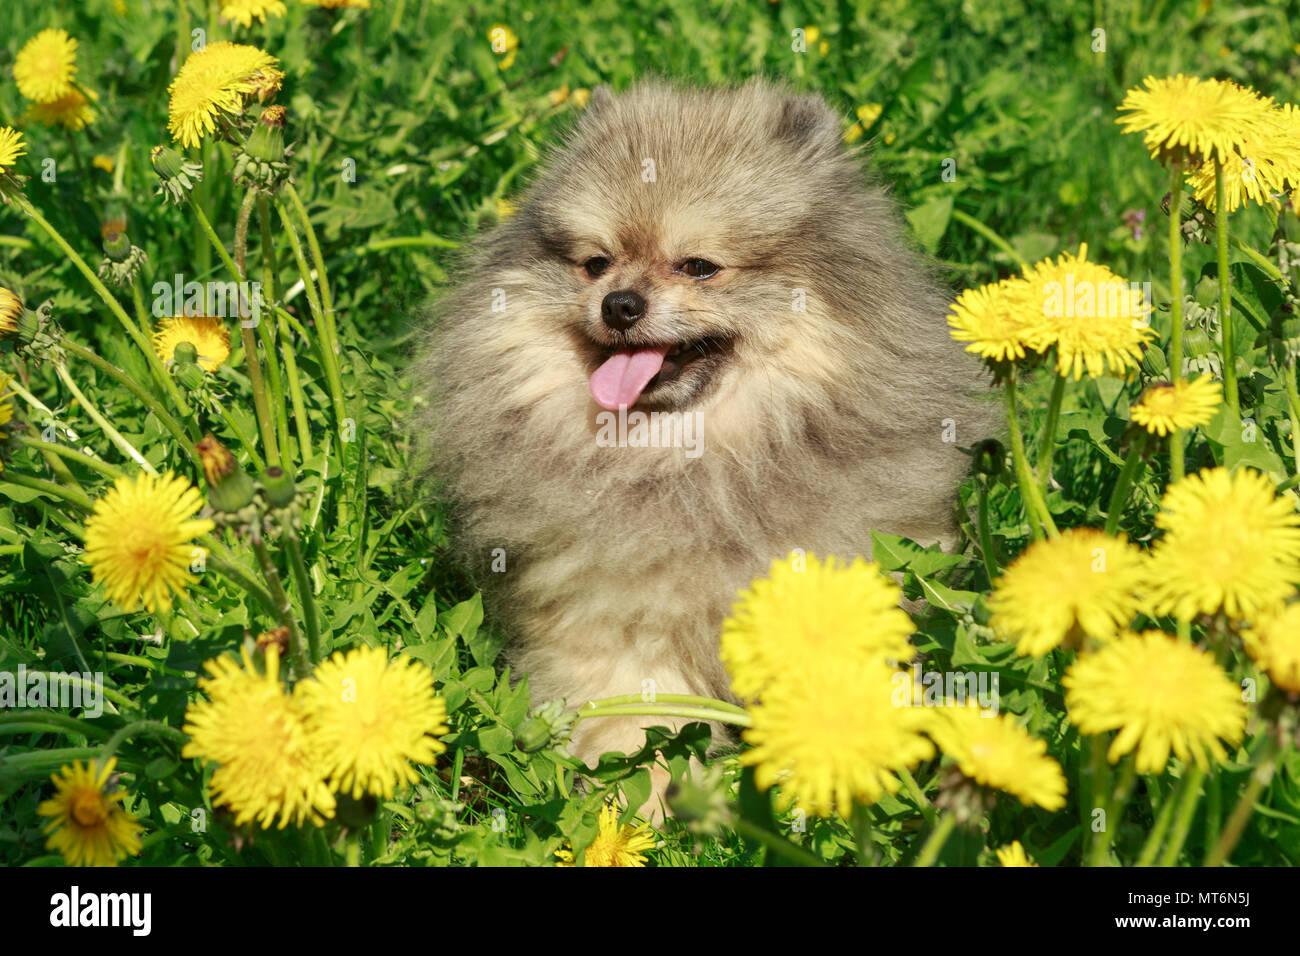 Small Dog Breed Pomeranian Walks In The Garden In Spring Stock Photo